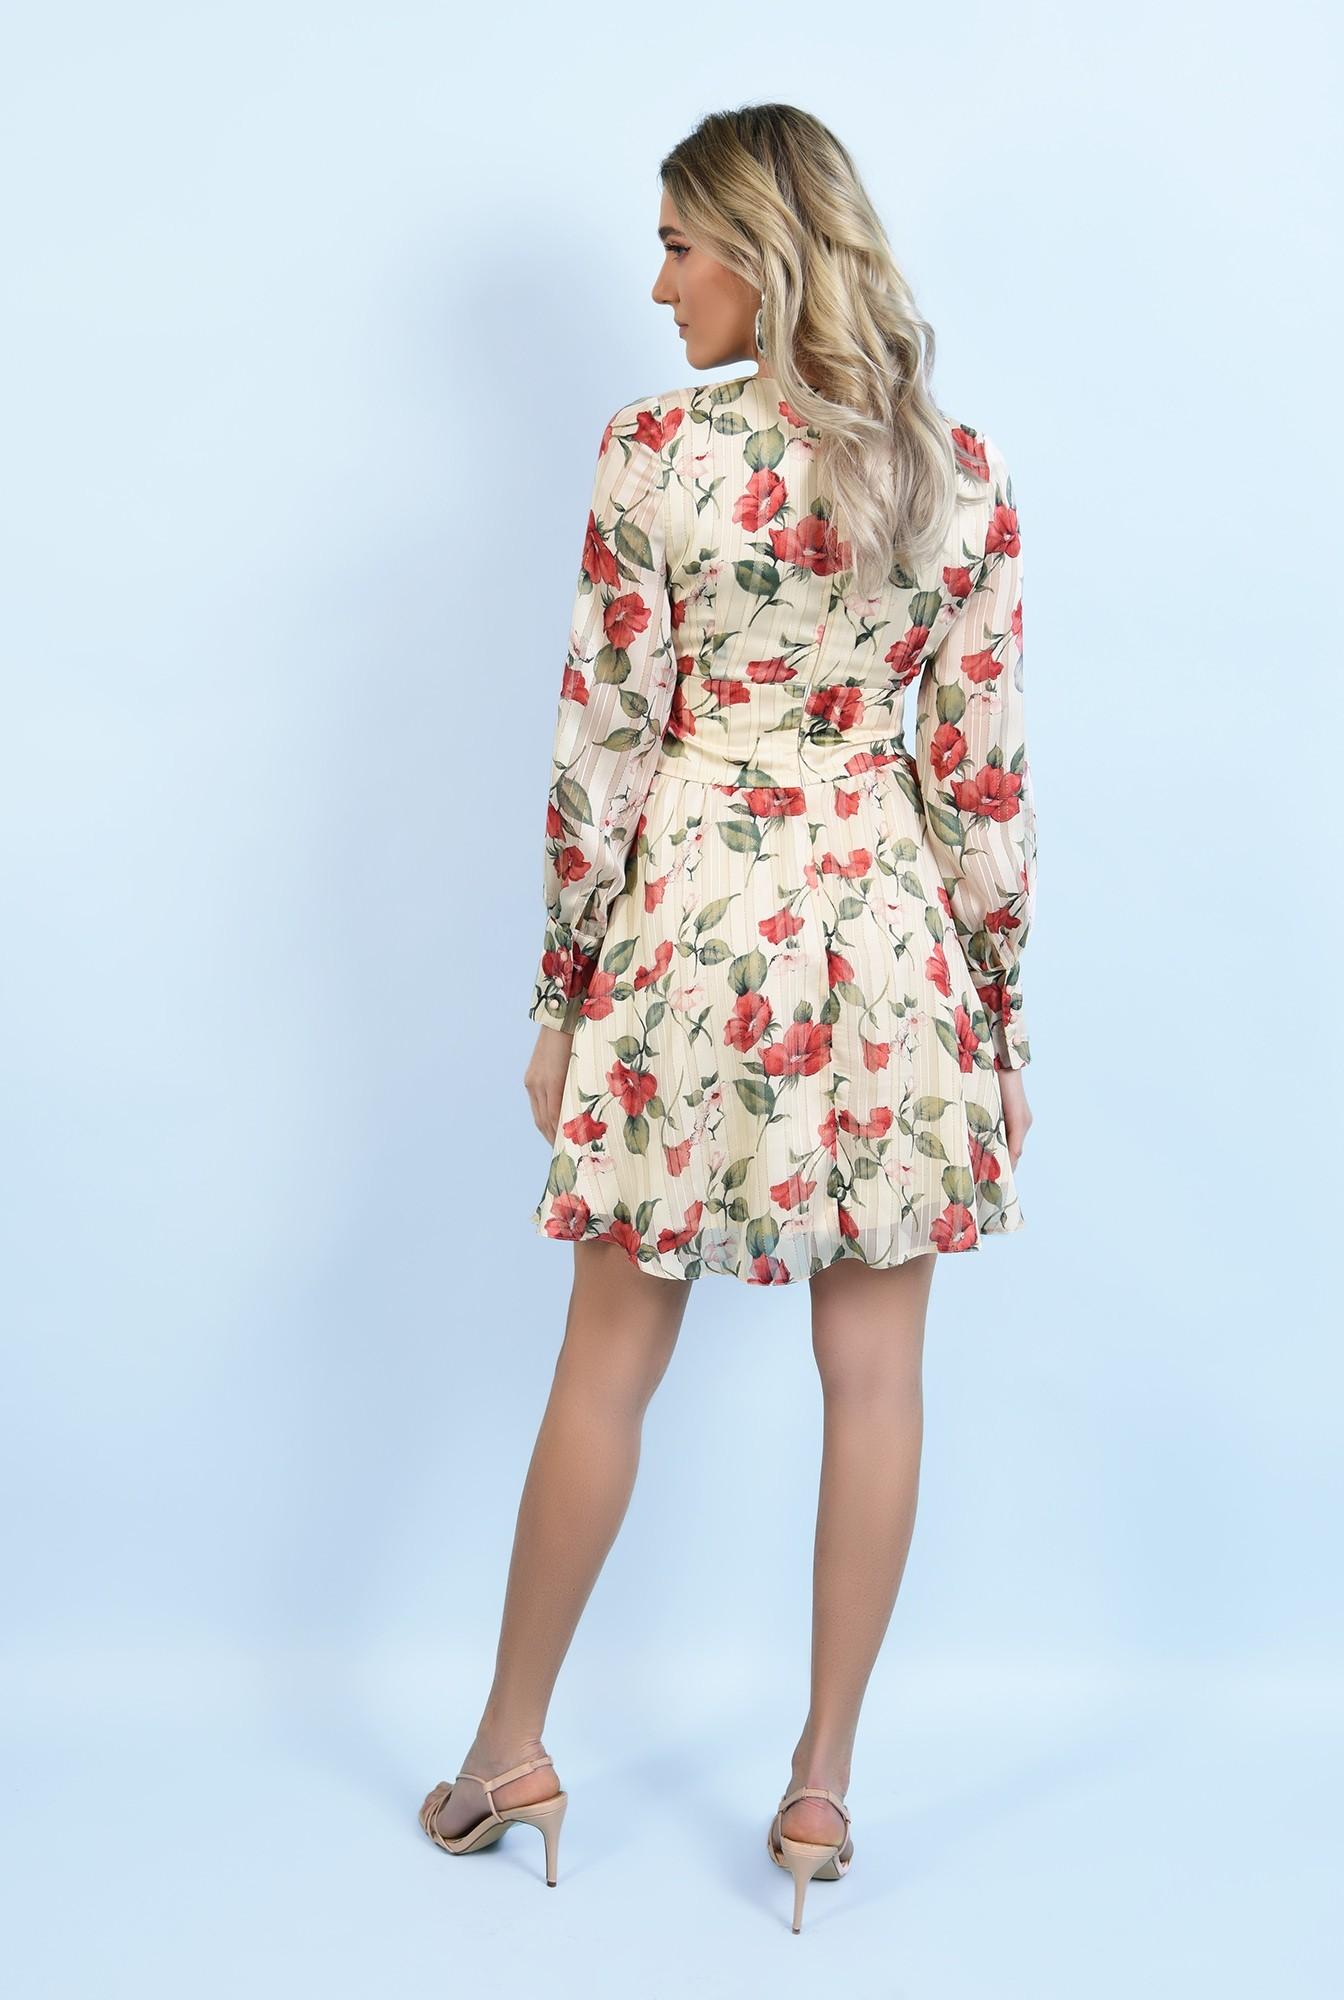 1 - rochie mini, din sifon, cu flori, maneci lungi, betelie fronsata